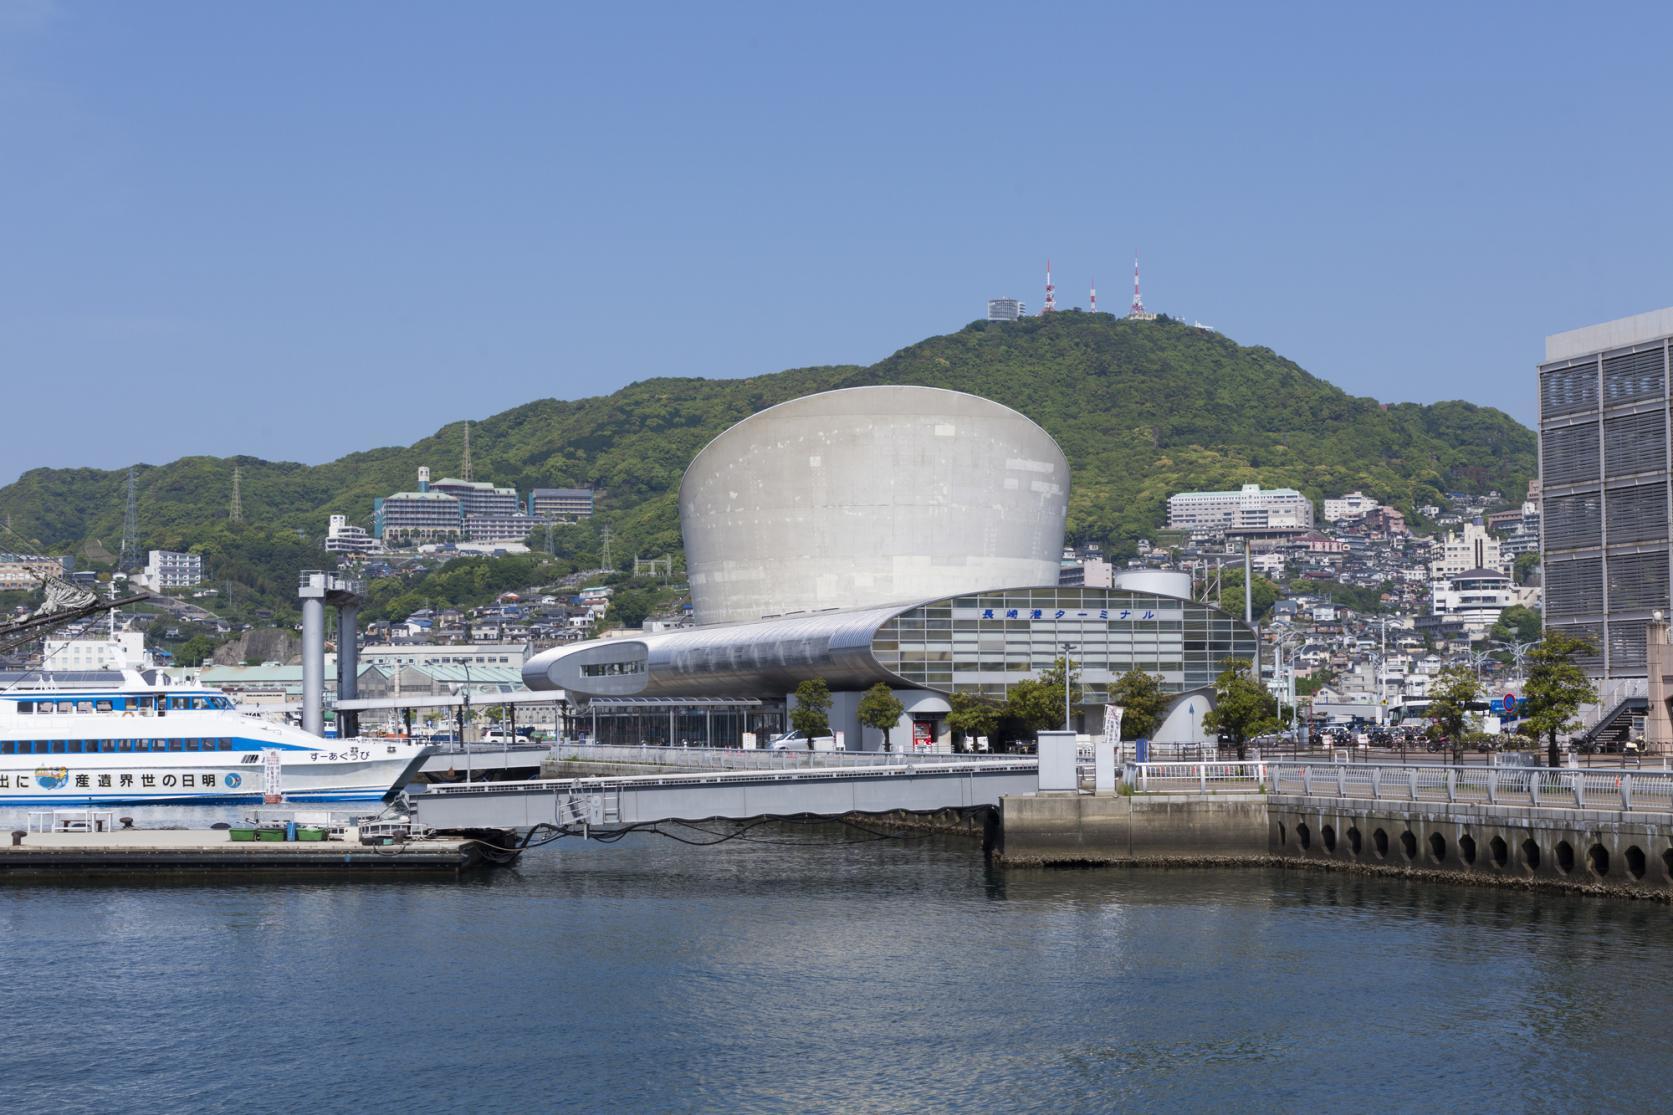 Gunkanjima (Hashima, Battleship Island) Landing & Cruising Tour-6